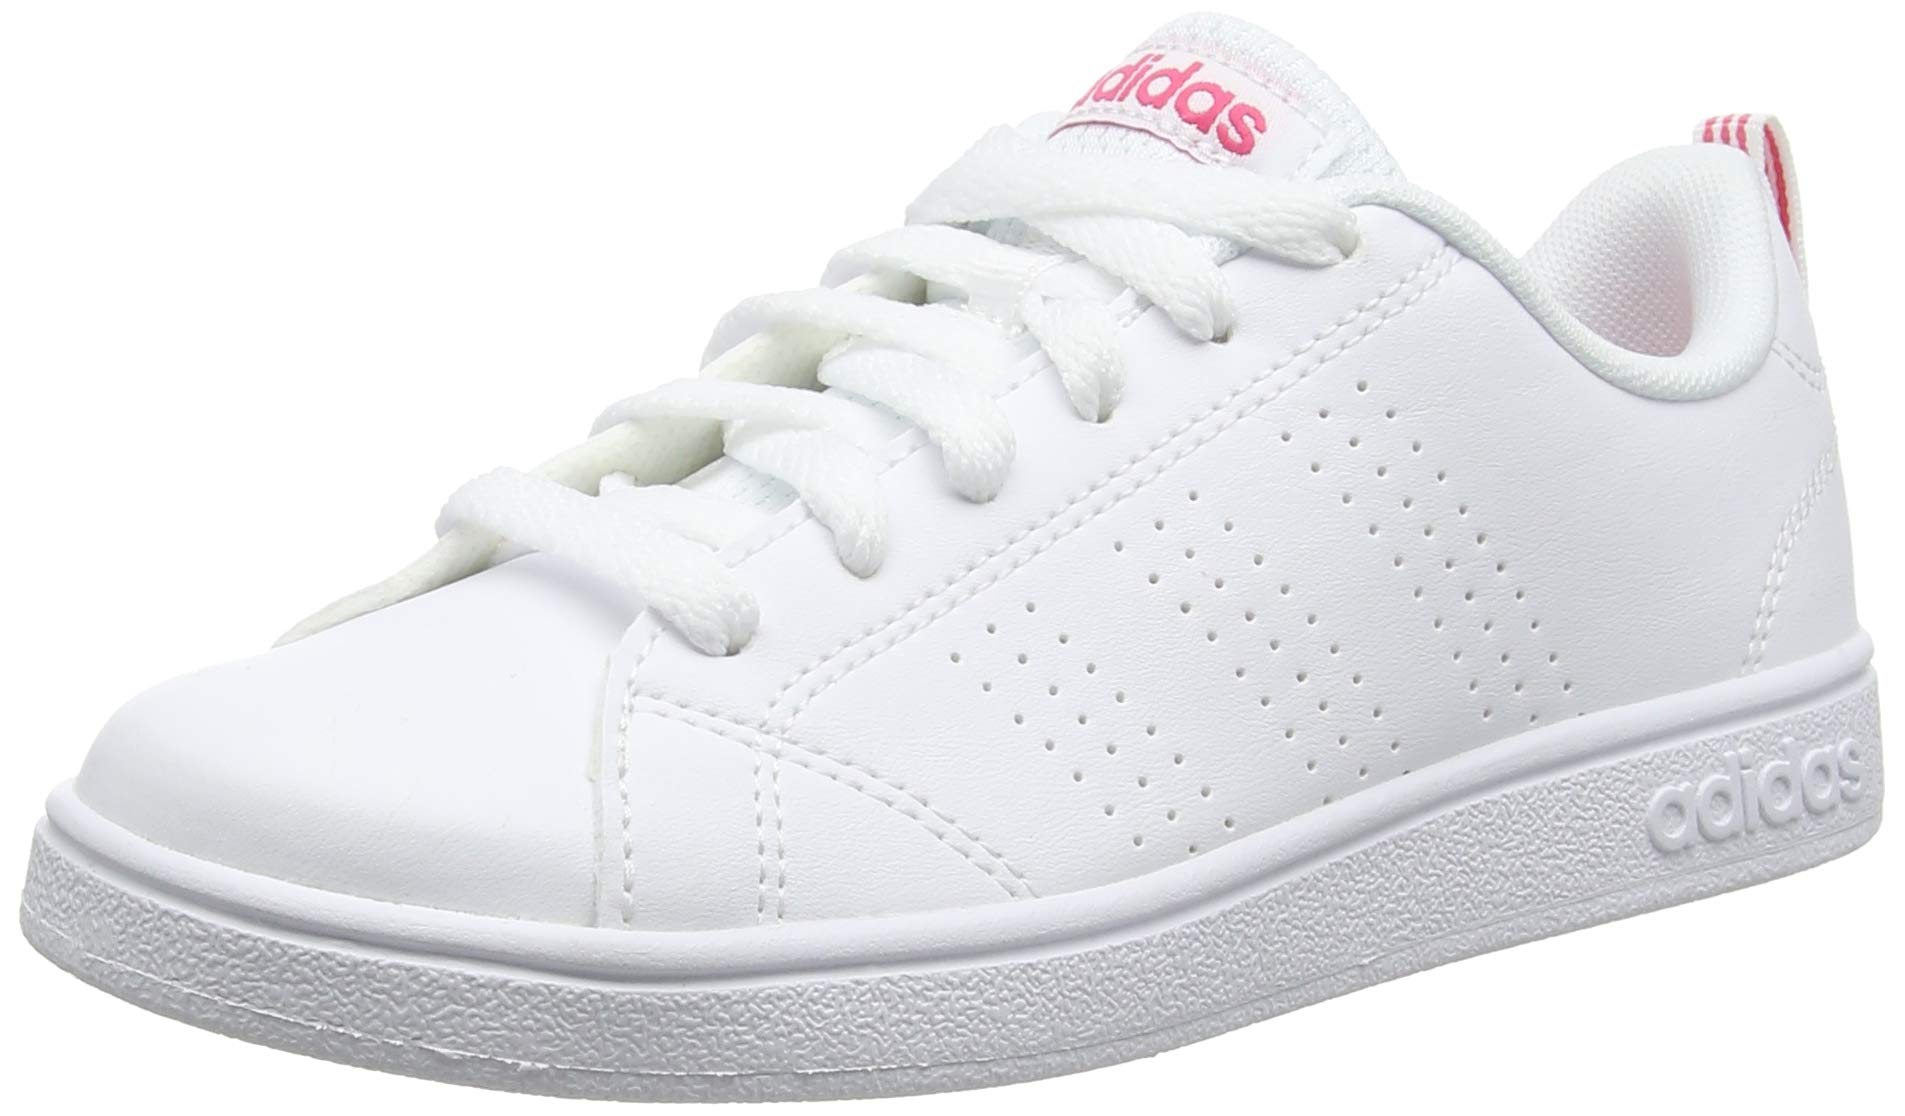 promo code bd985 764b2 adidas Vs Advantage Cl K, Chaussures de Running Mixte Enfant product image